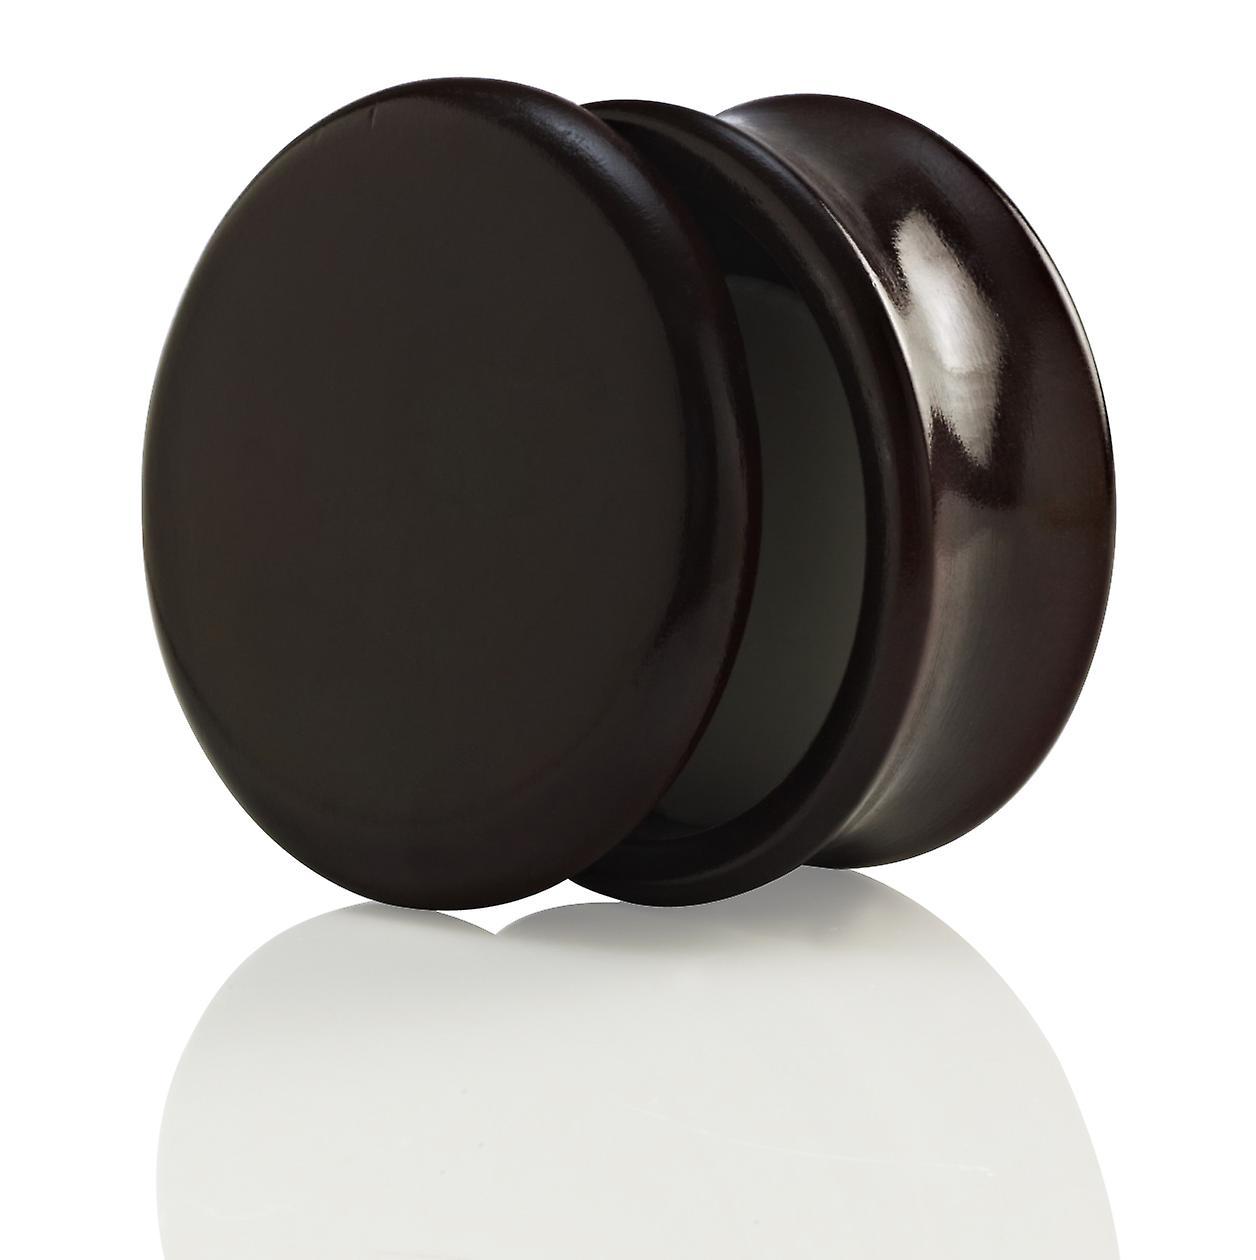 Parker Shaving Soap Bowl - Black Mango